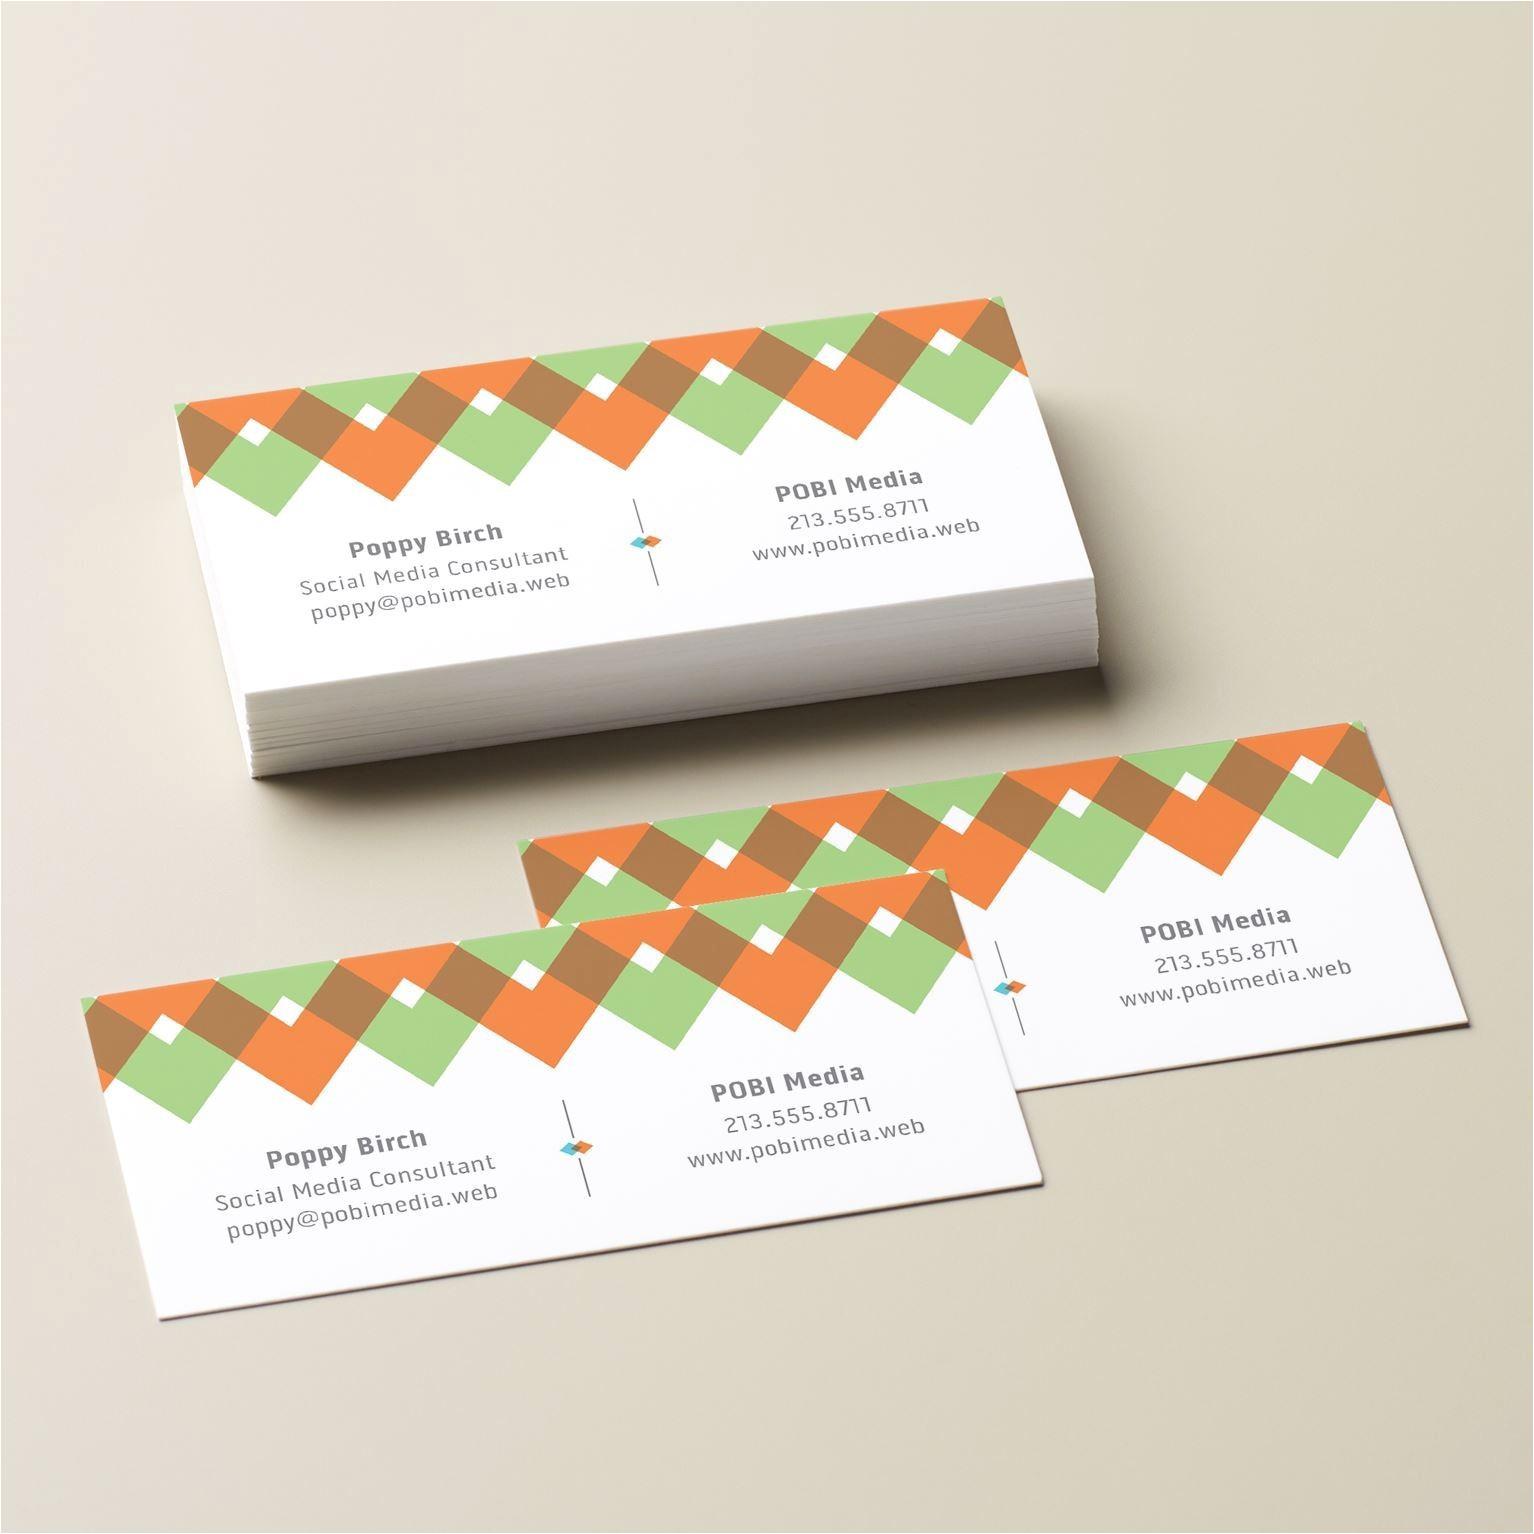 vistaprint business card template size ai download 9 99 of vistaprint business card templates of vistaprint business card templates jpg